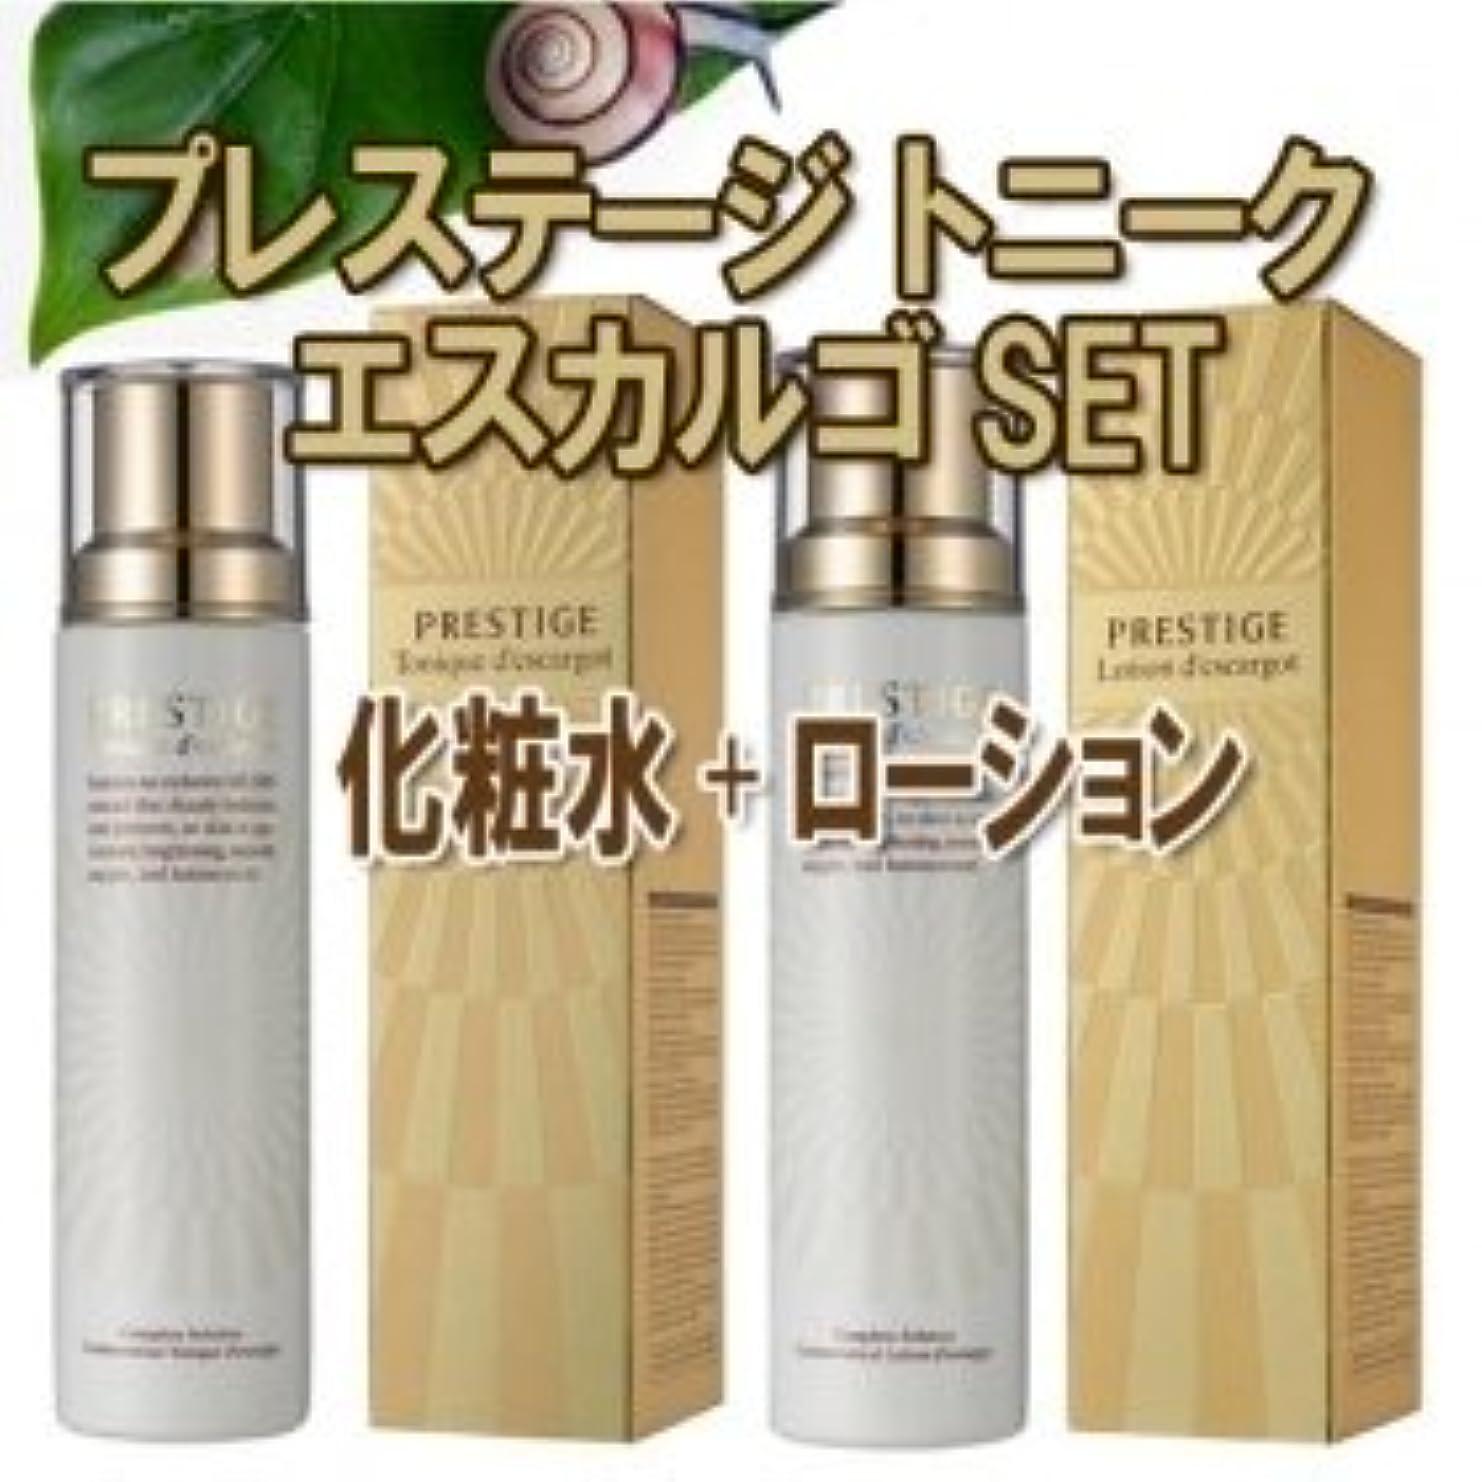 It`s skin(イッツスキン)プレステージ トニーク エスカルゴ化粧水+ローションセット 格安 韓国コスメ 海外直送品